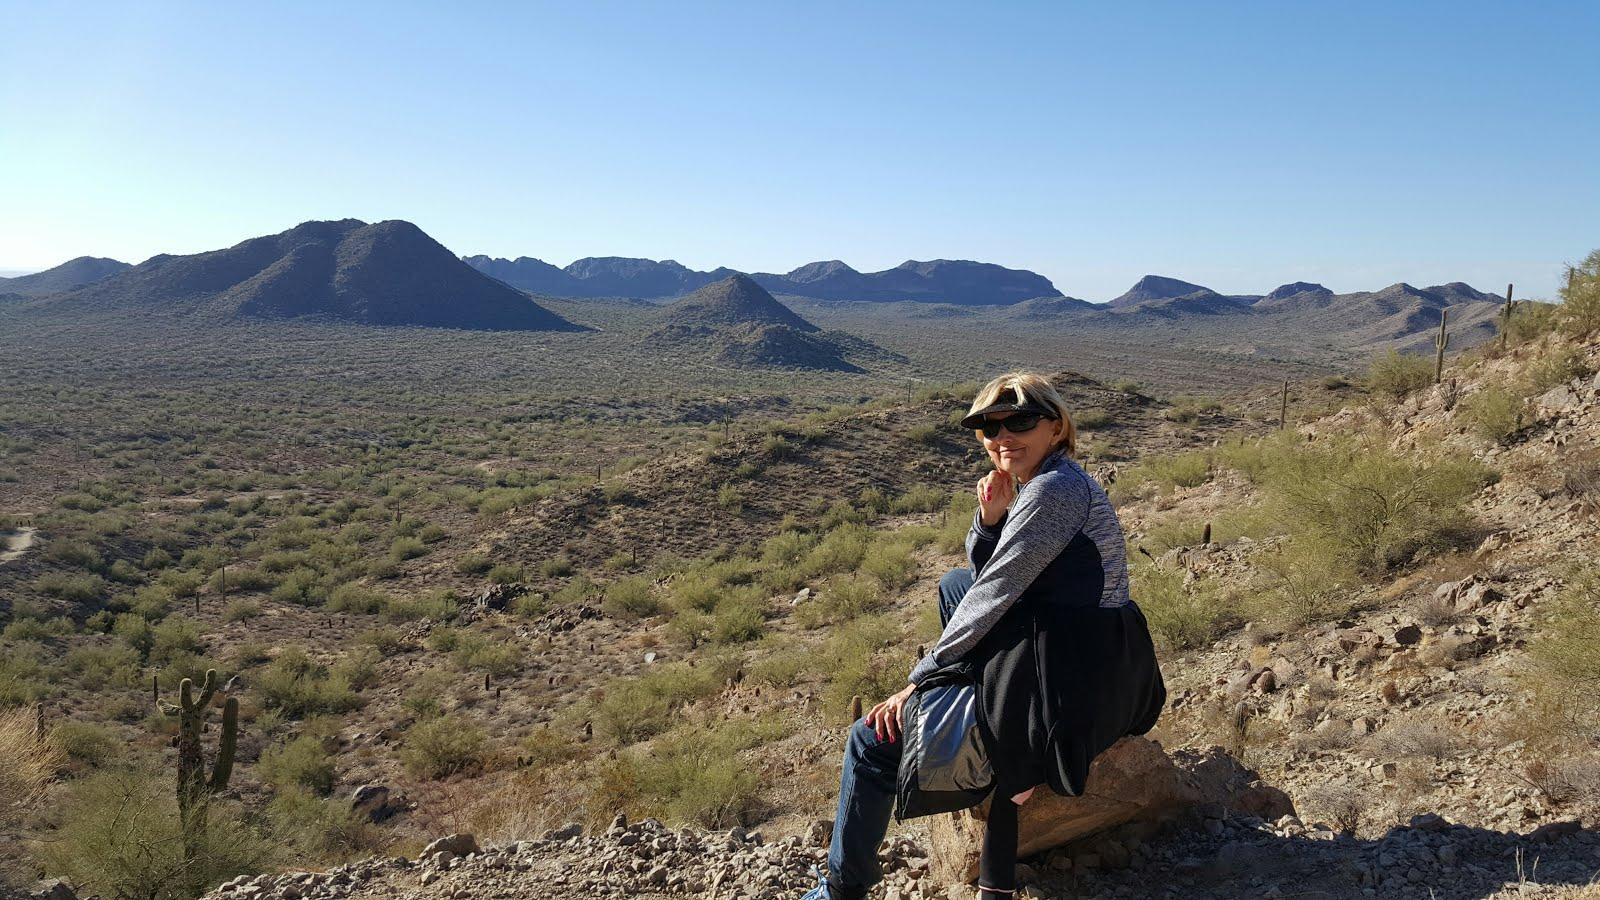 Hiking in Arizona